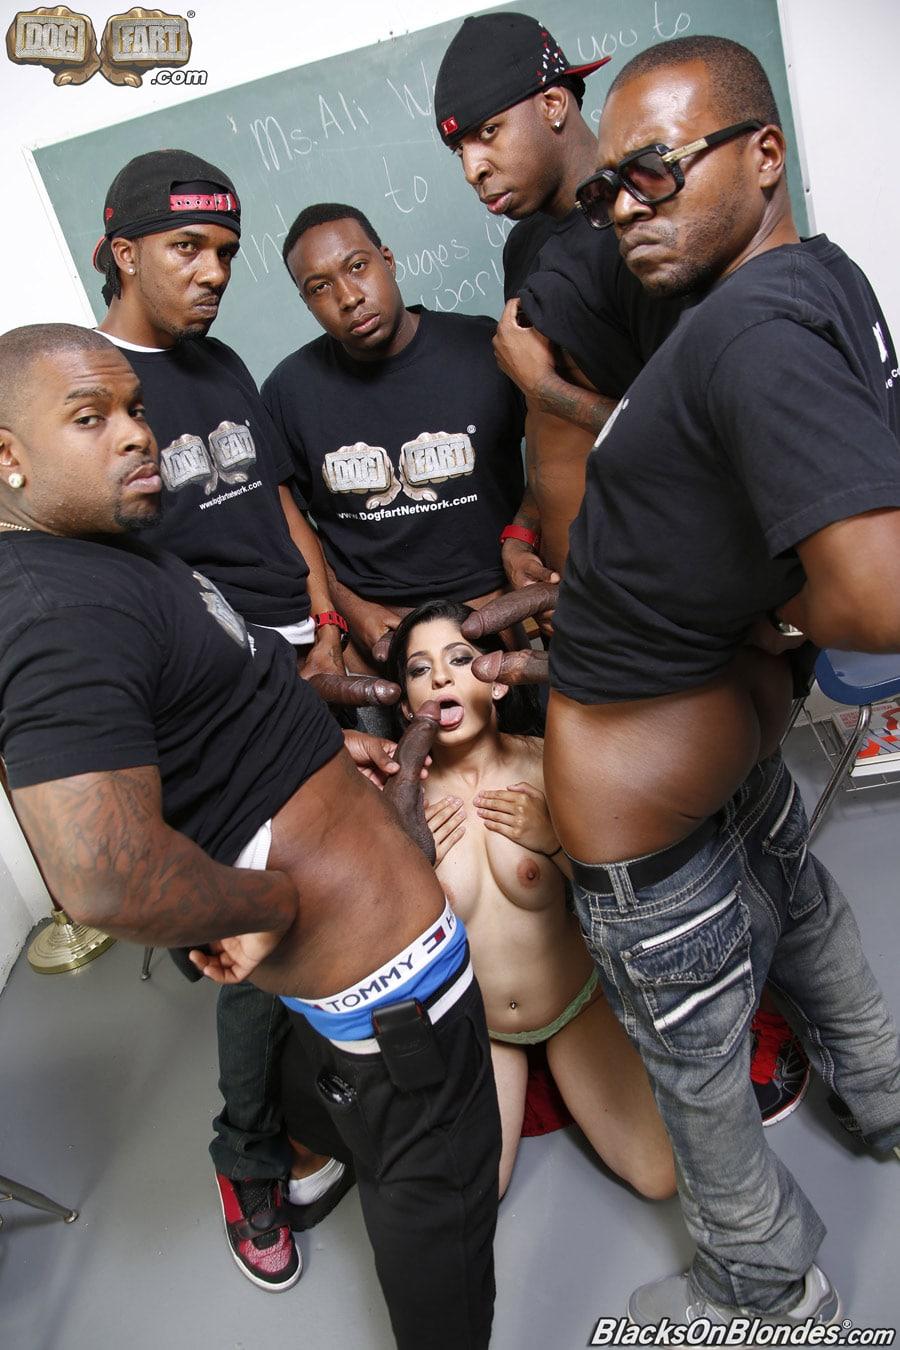 nadia-ali-gangbang-interracial-blacksonblondes-8